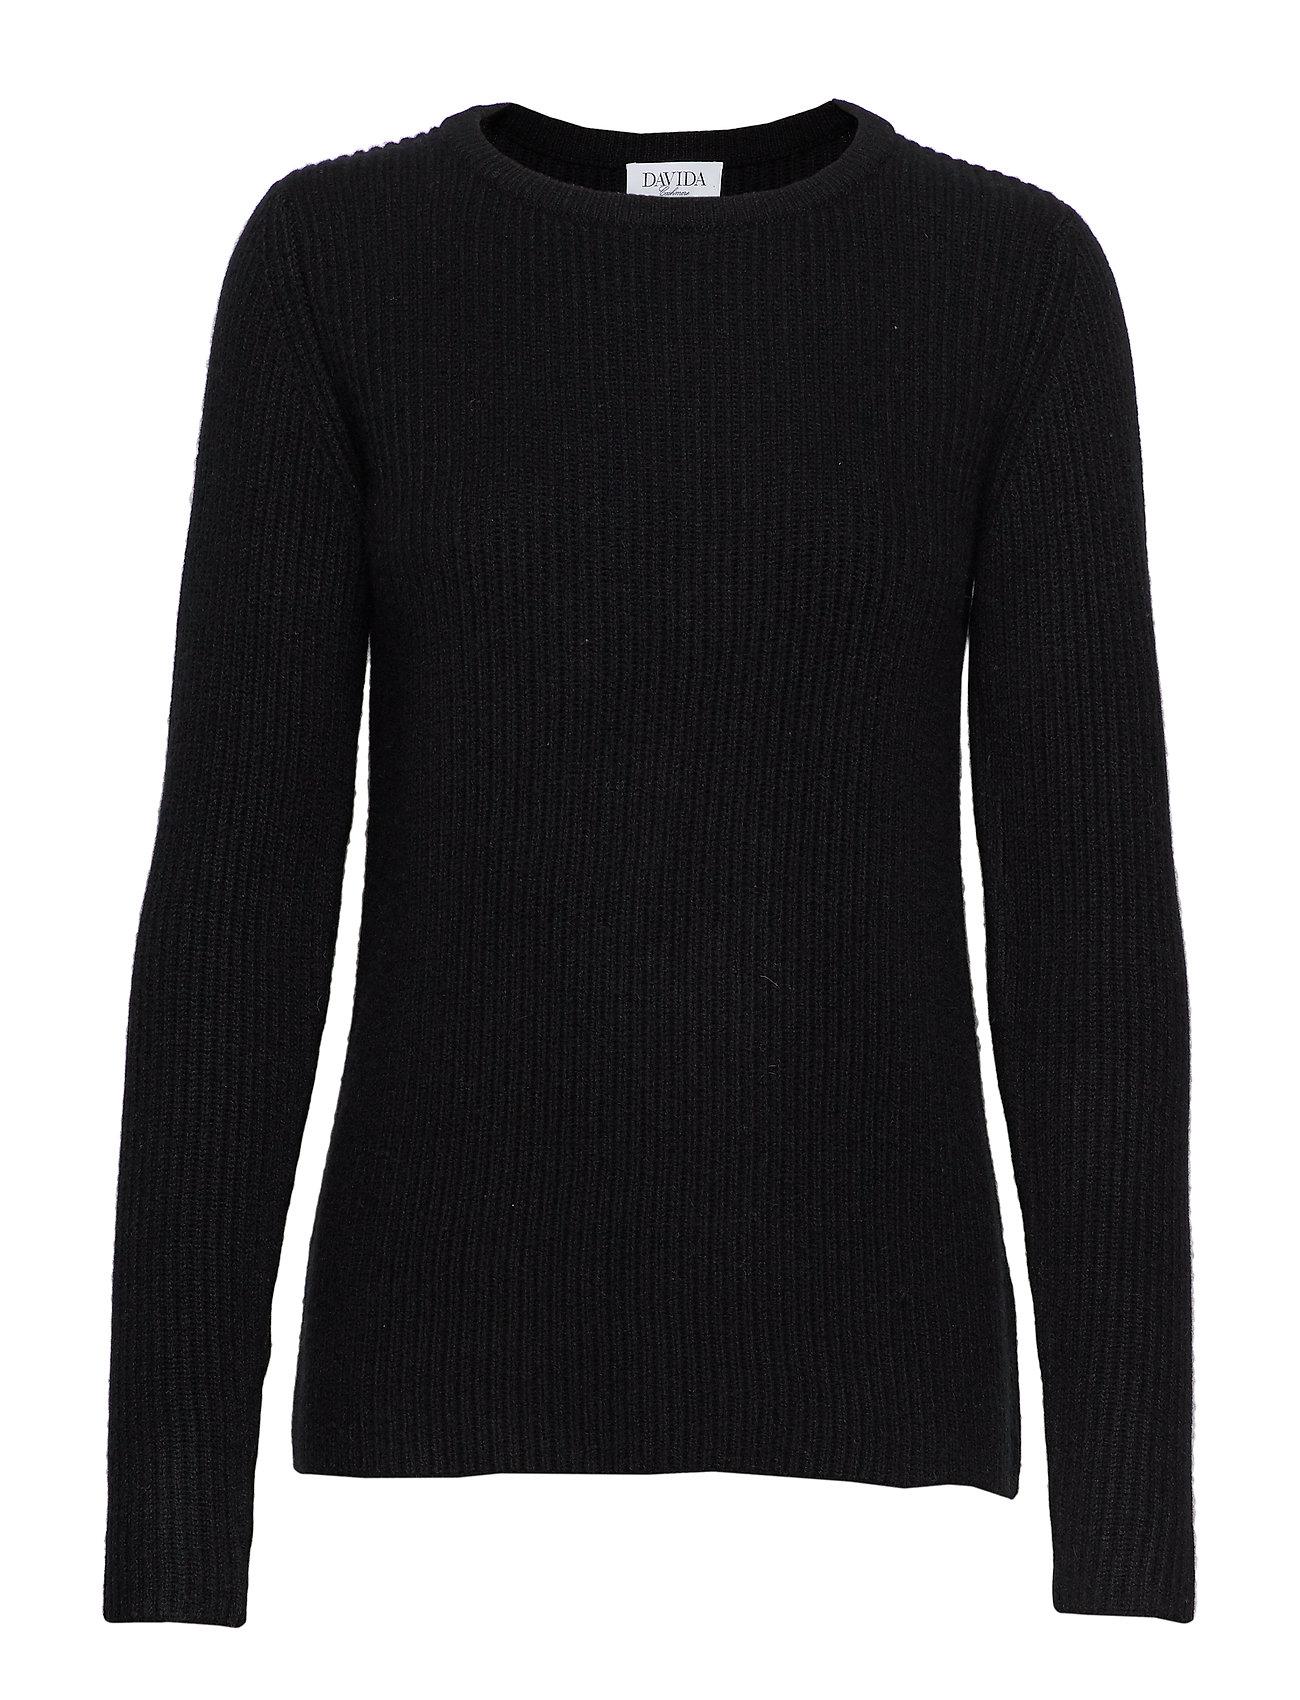 Davida Cashmere Chunky O-neck Rib Sweater - BLACK